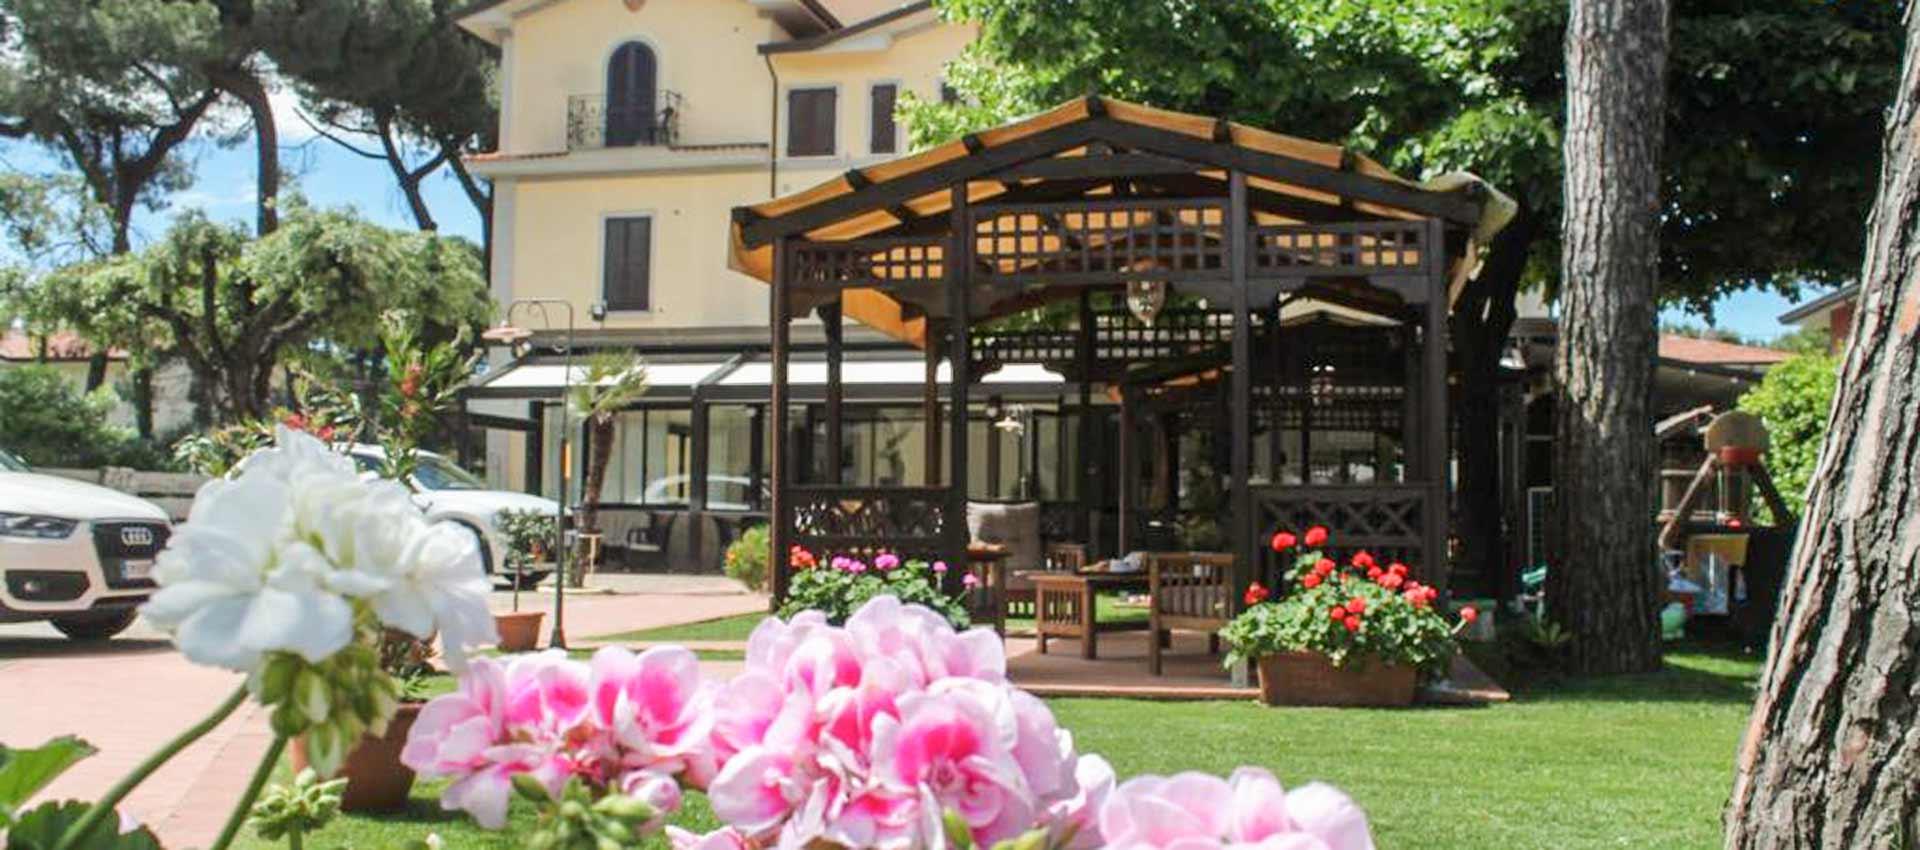 Hotel Virginia Marina di Massa, Toscana